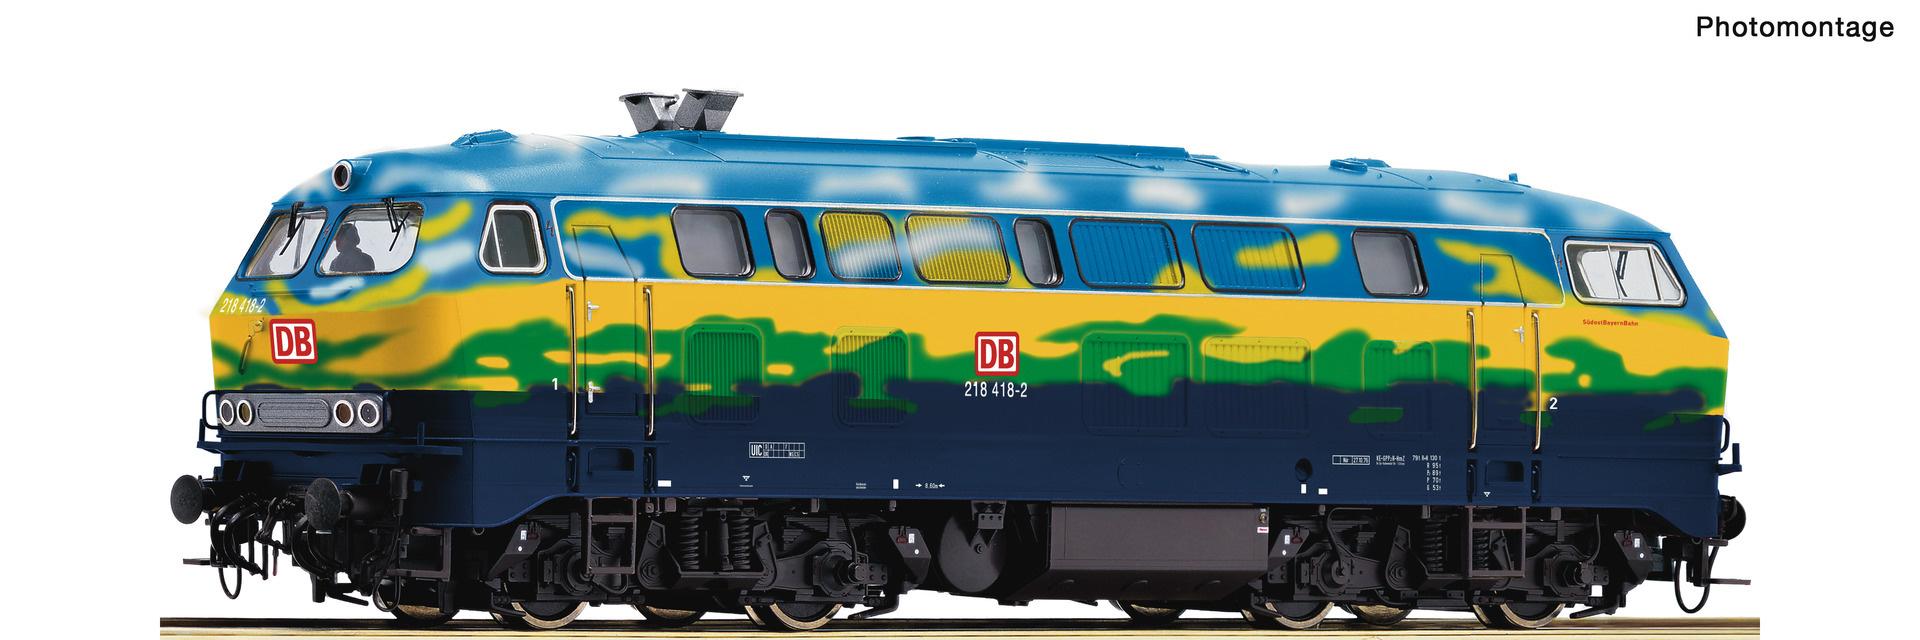 70758 Diesellok BR 218 Touri Snd.-1